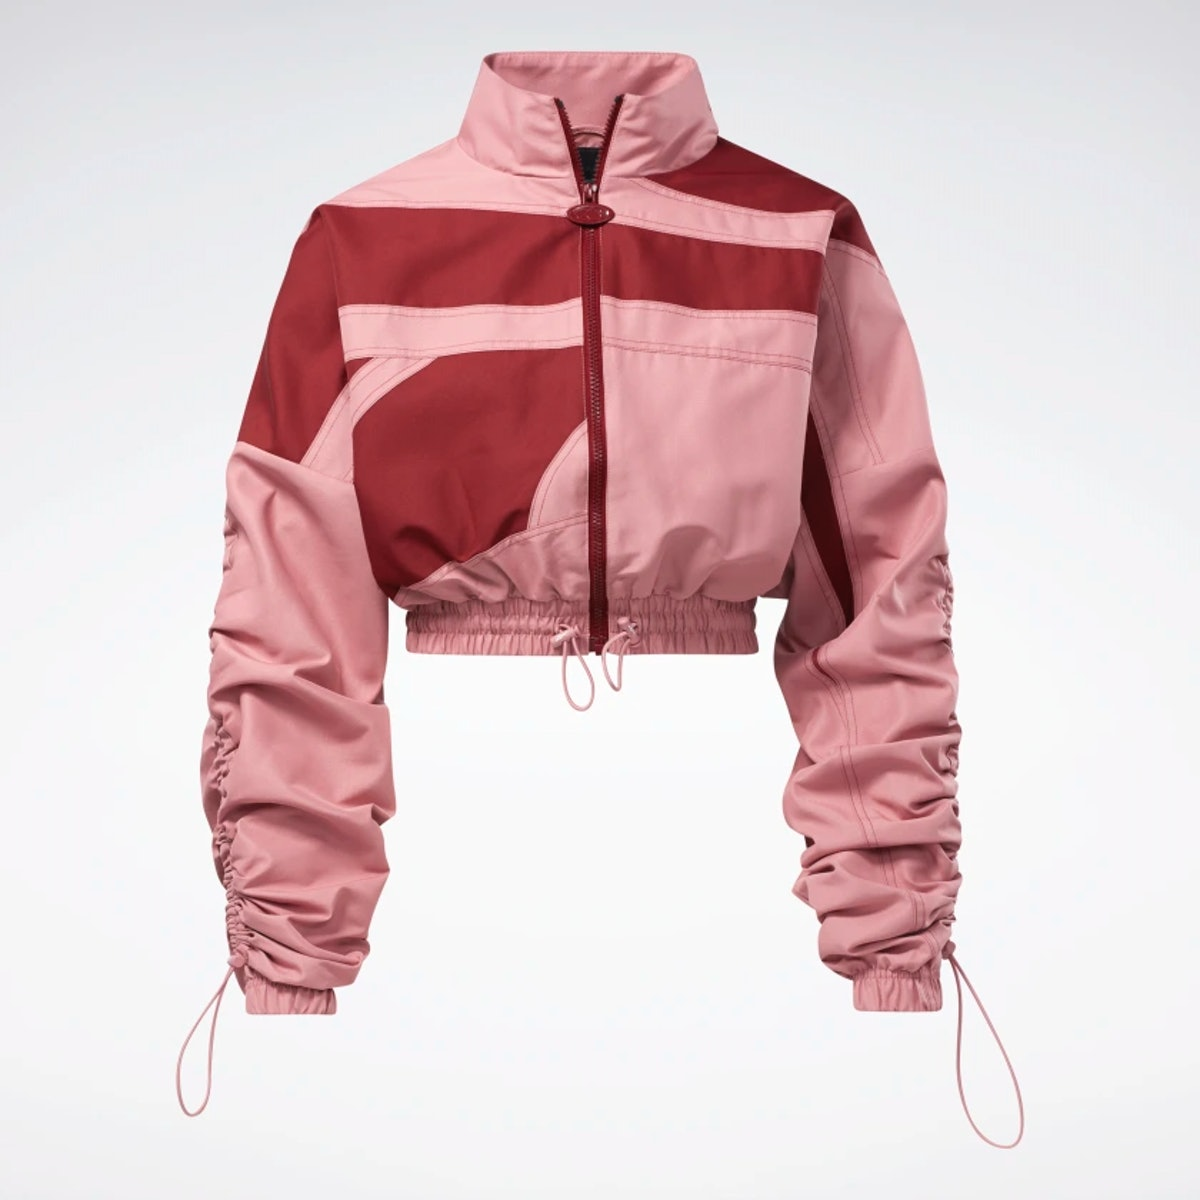 Cardi B's woven satin Reebok jacket.